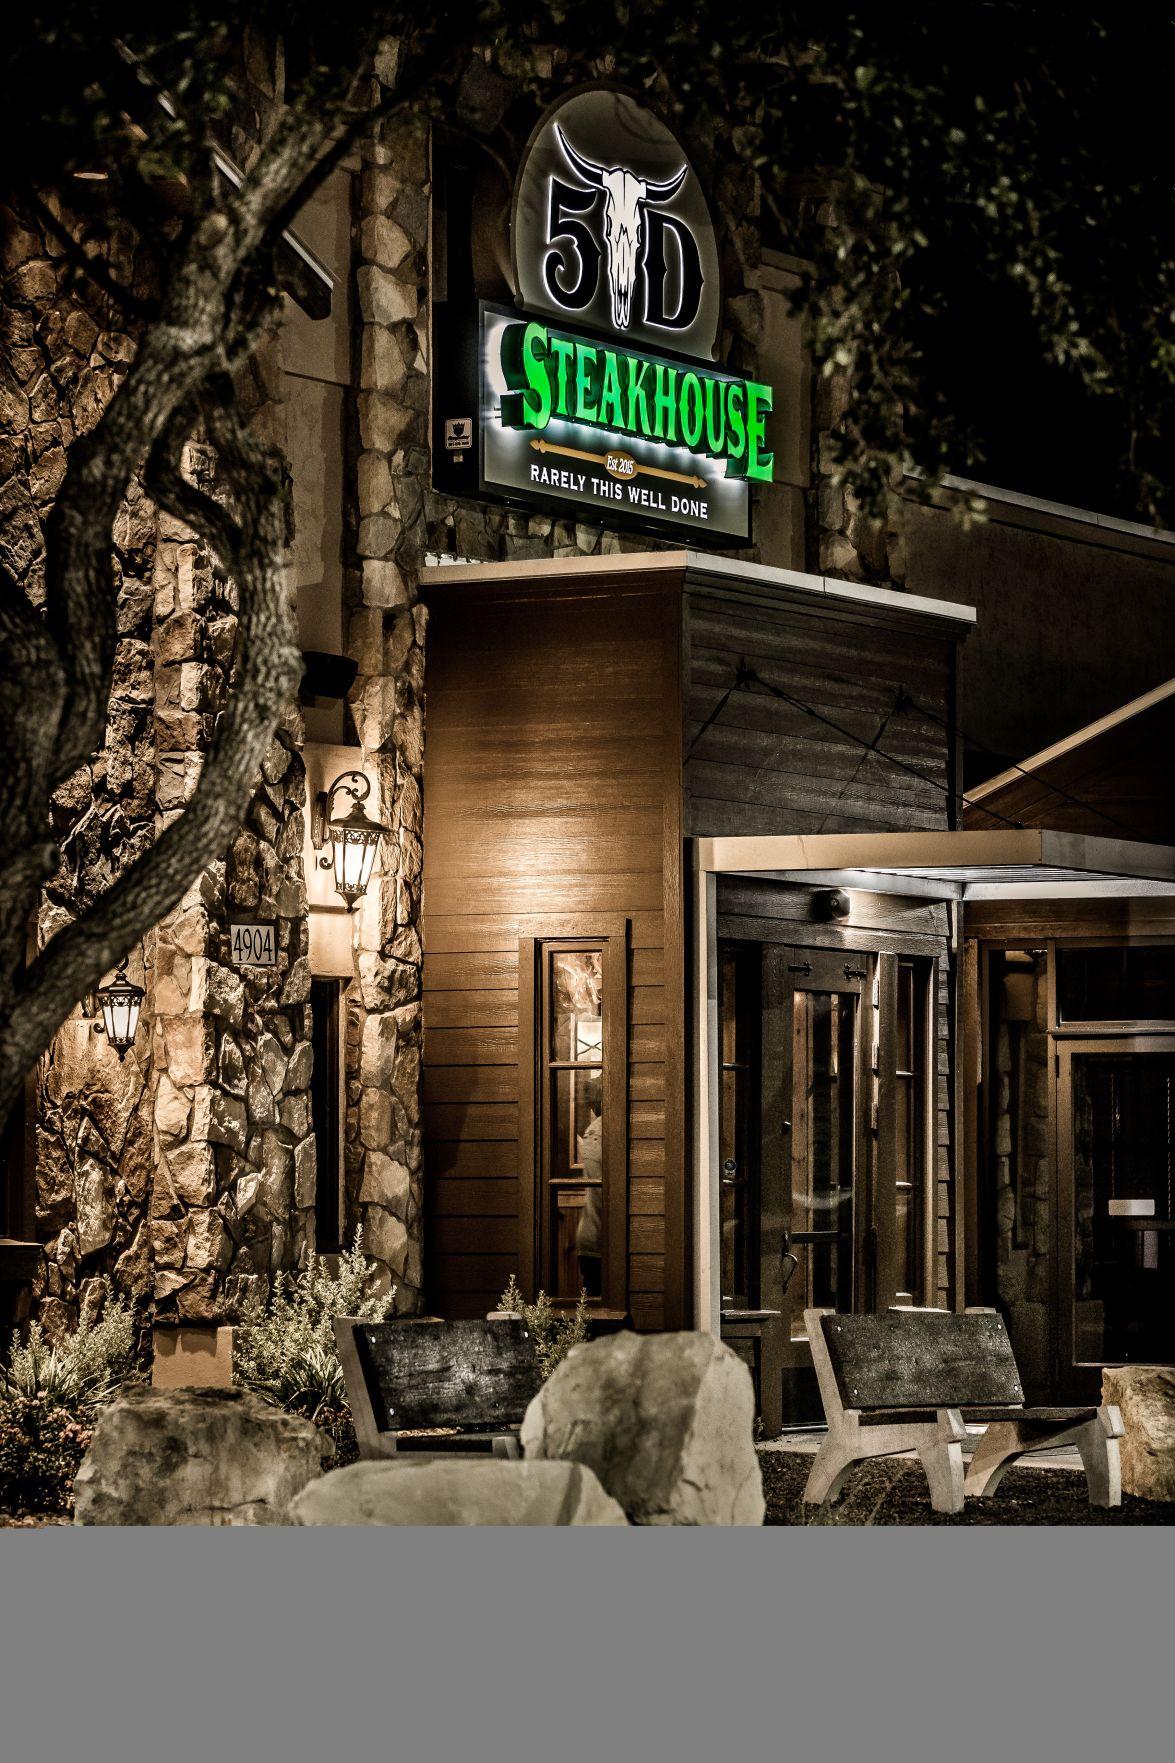 5D Steakhouse